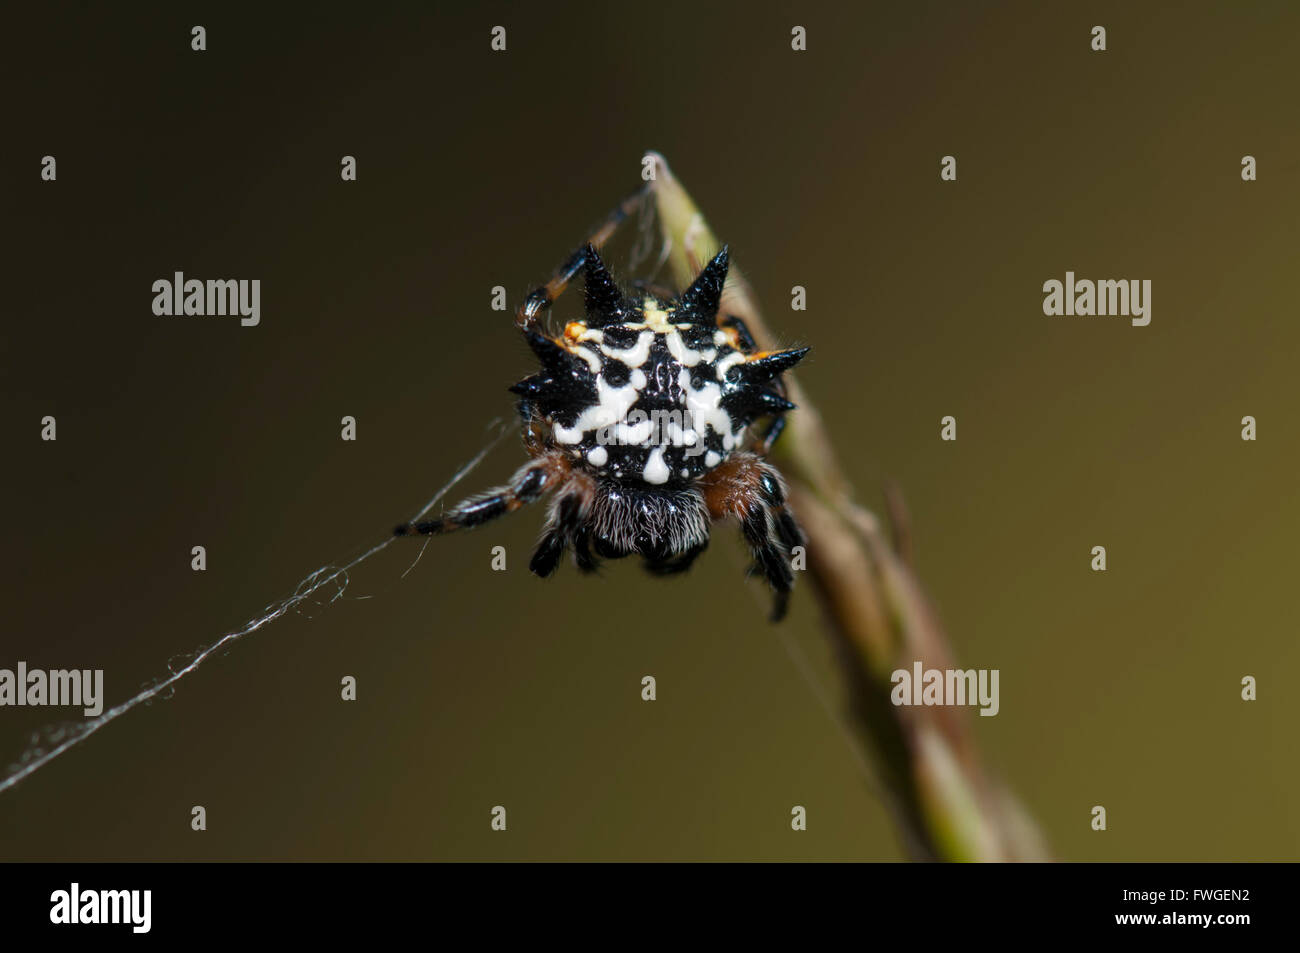 Australian Jewel Spider (Austracantha minax), Western Australia, Australia - Stock Image